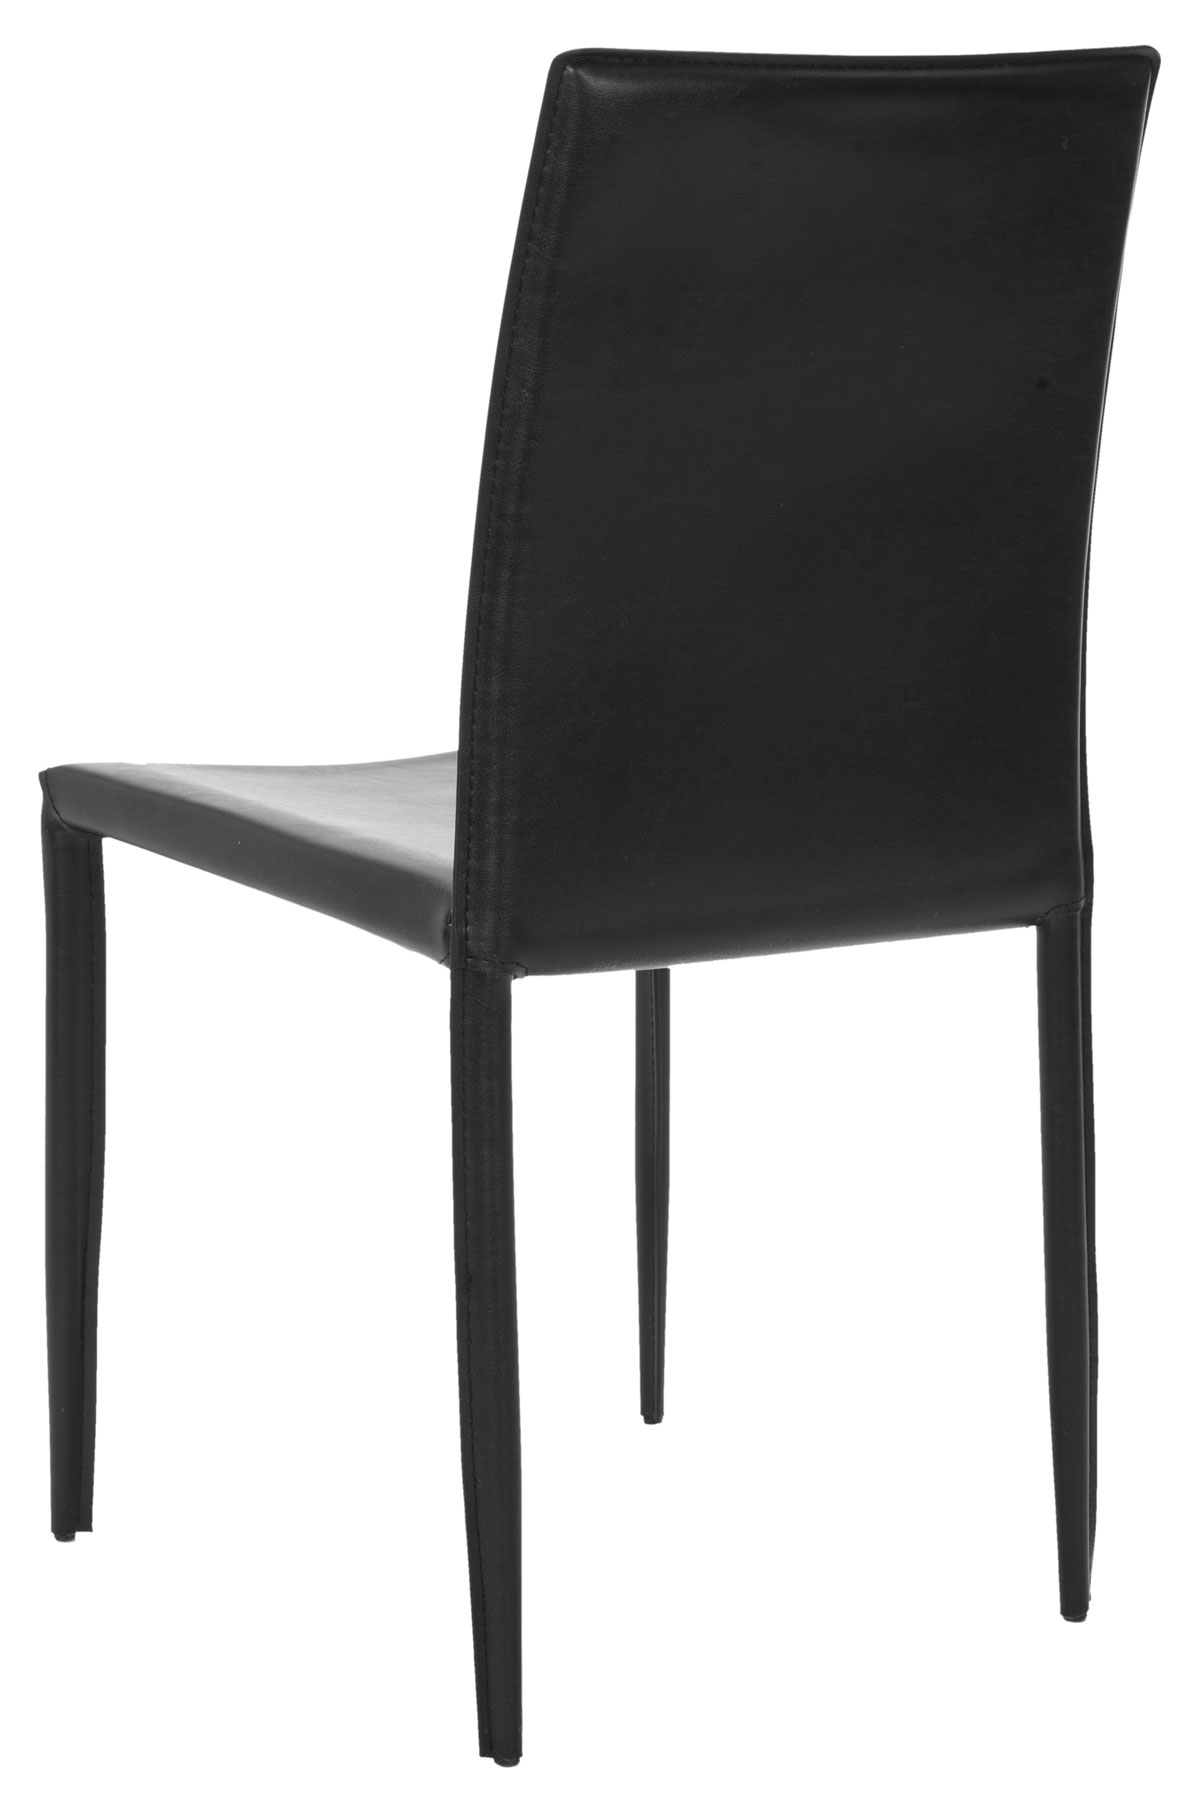 safavieh karna dining chair lounge covers fox2009b set2 chairs furniture by